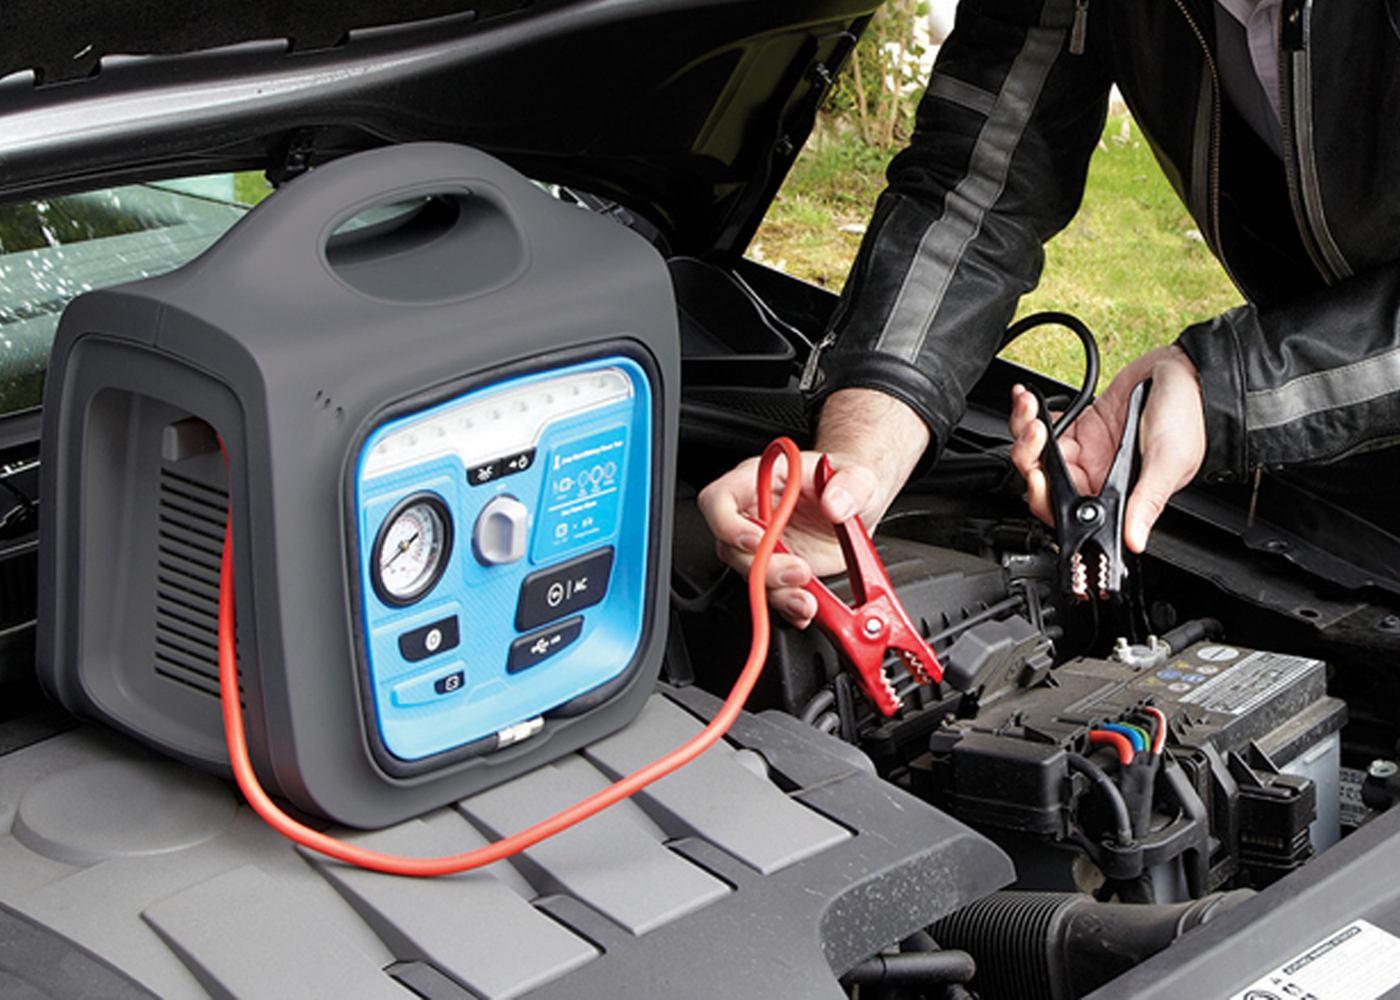 LED Work Light /& Compressor Ring Automotive RPP170 Power Pack Jump Starter USB